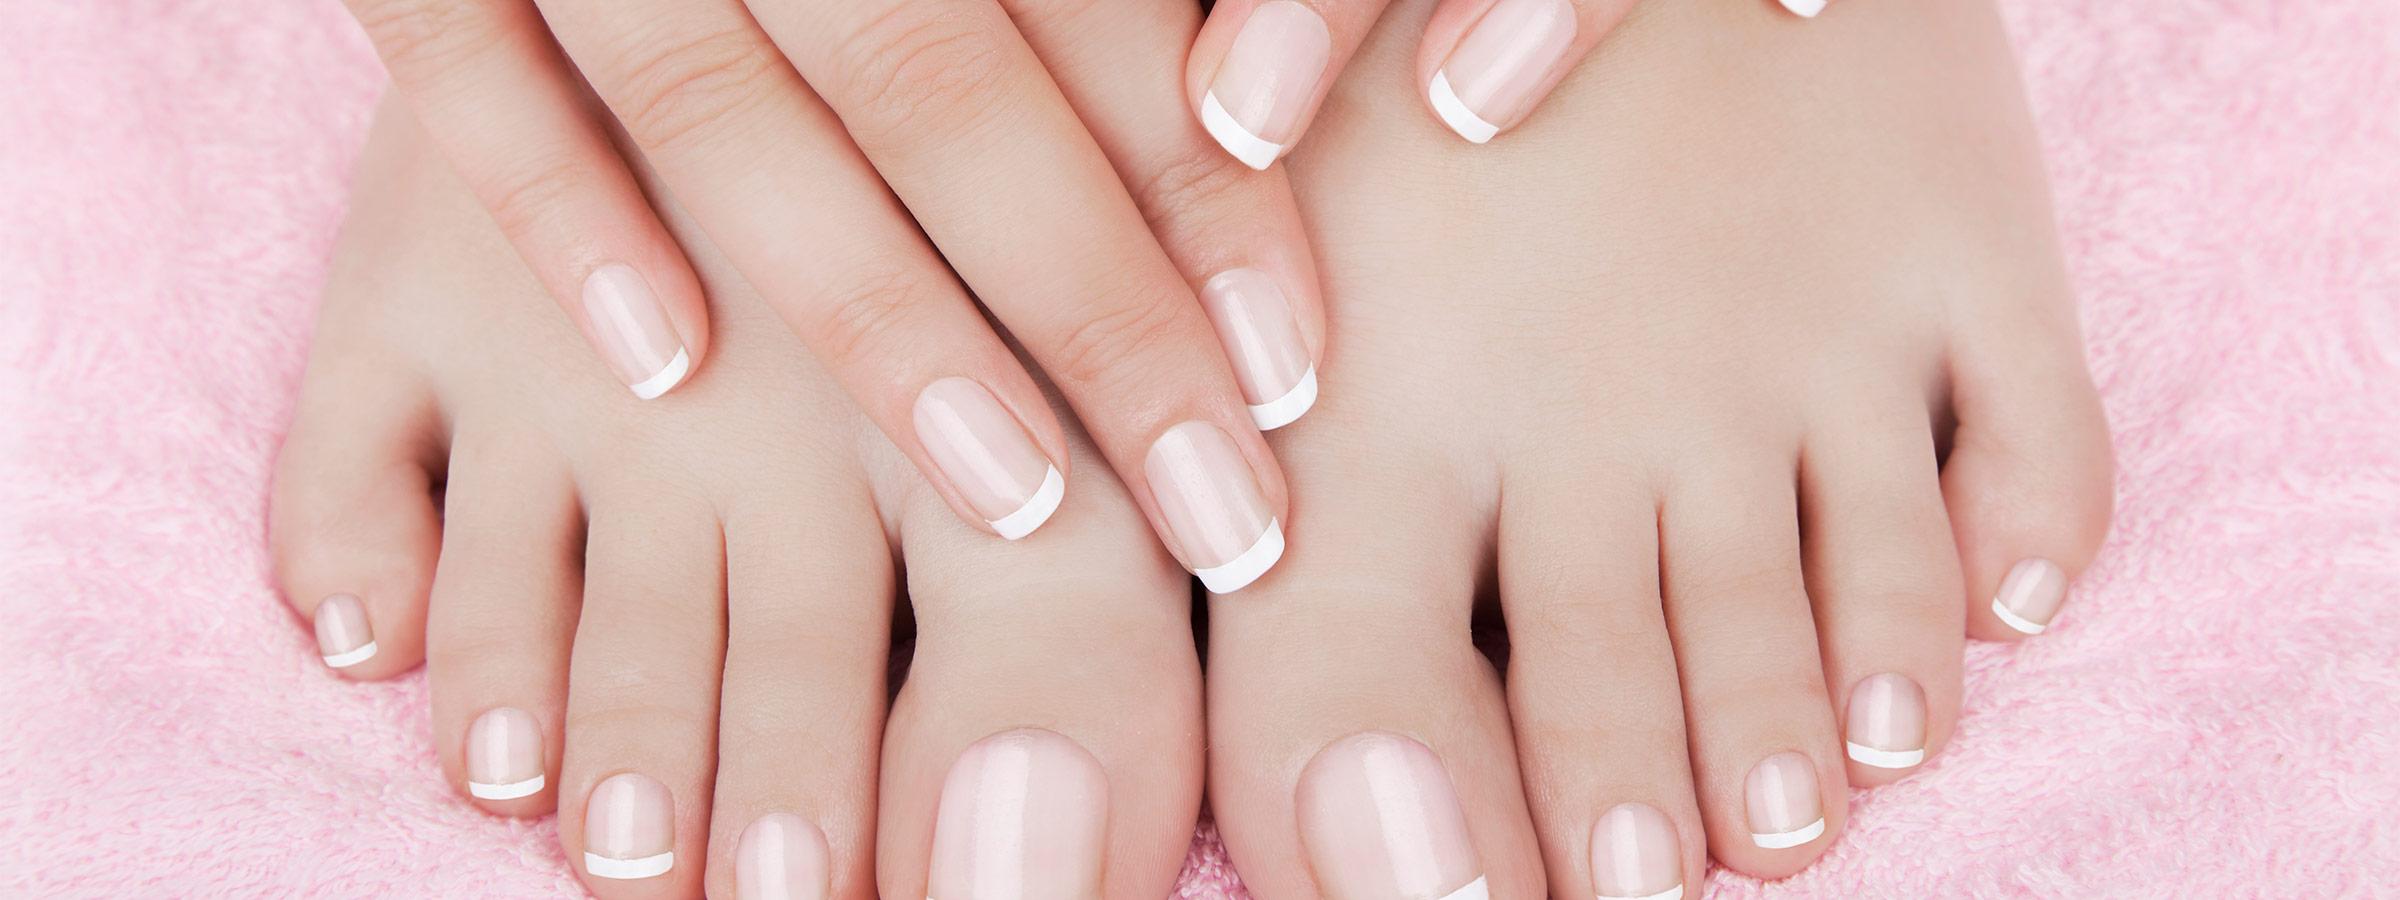 argan nail cuticle oil featured